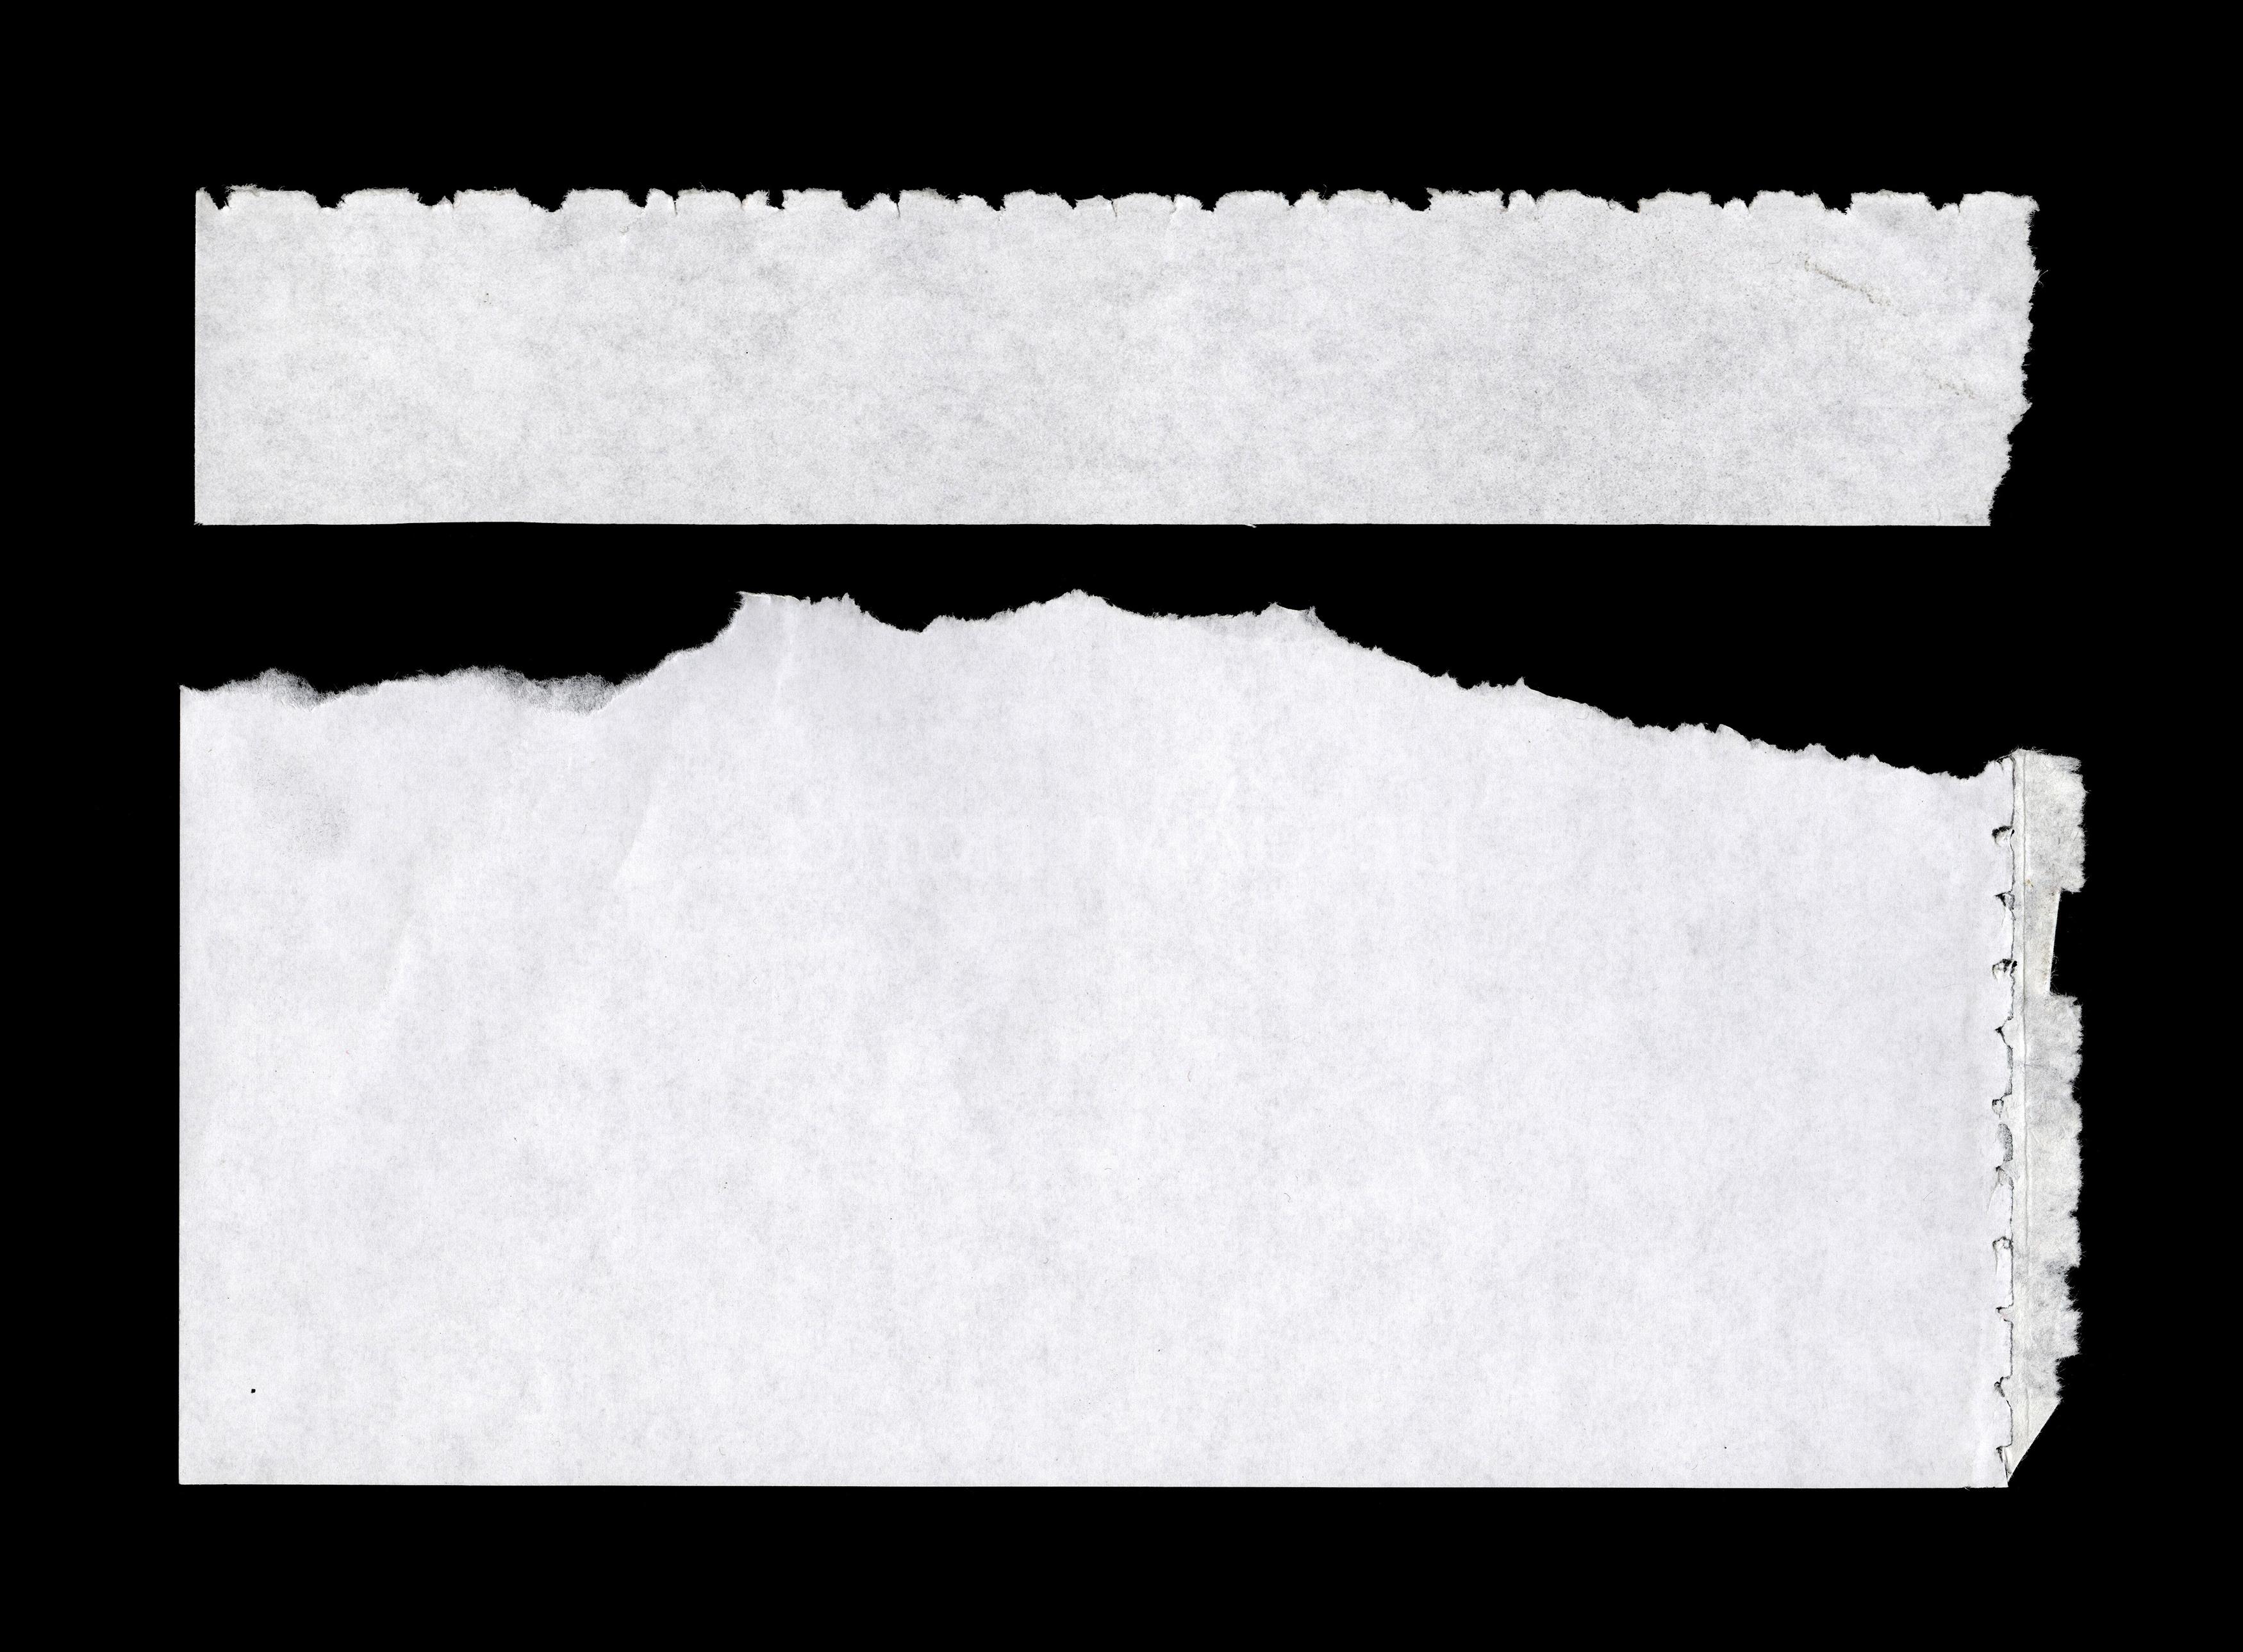 3500x2578 Torn Paper Texture Fabrik